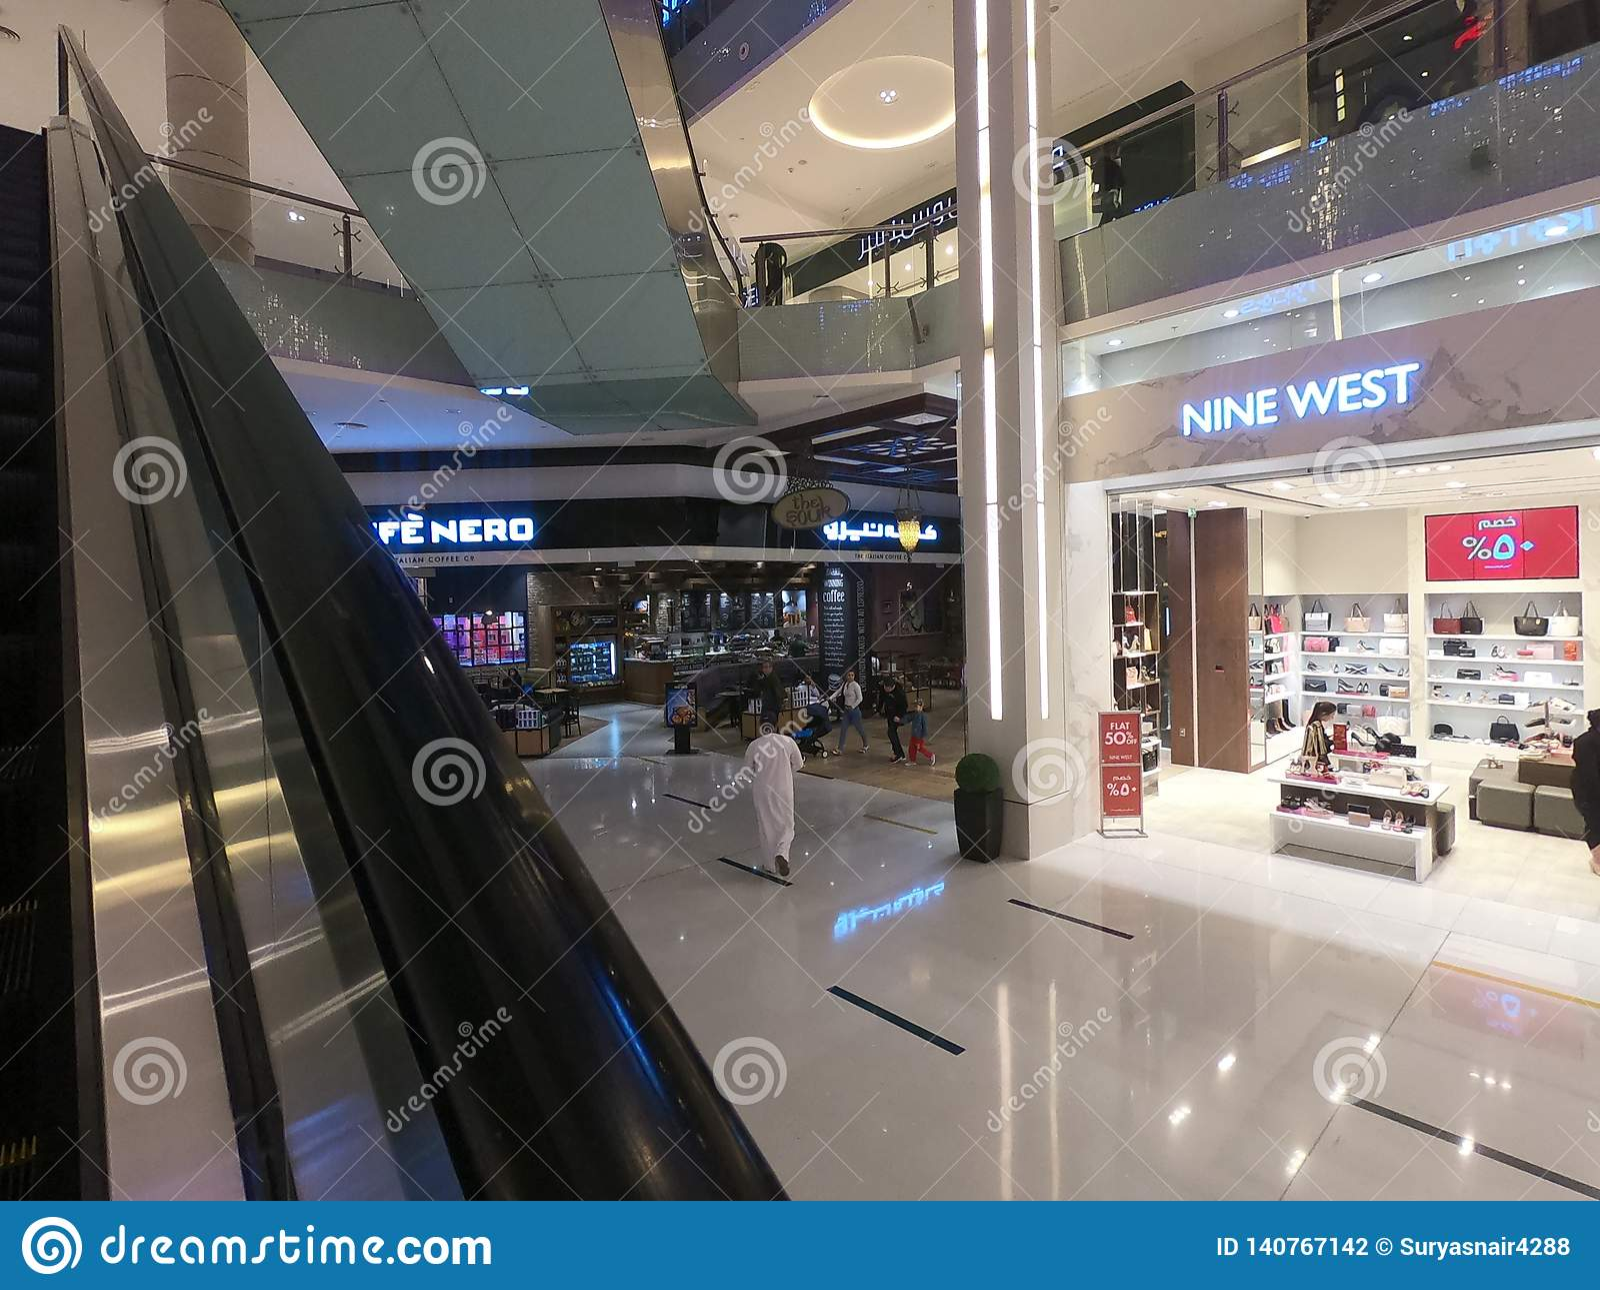 Im Februar 2019 das größte Mall - Geschäft des Westen-neun innerhalb Dubai-Malls - Welt Dubais UAE